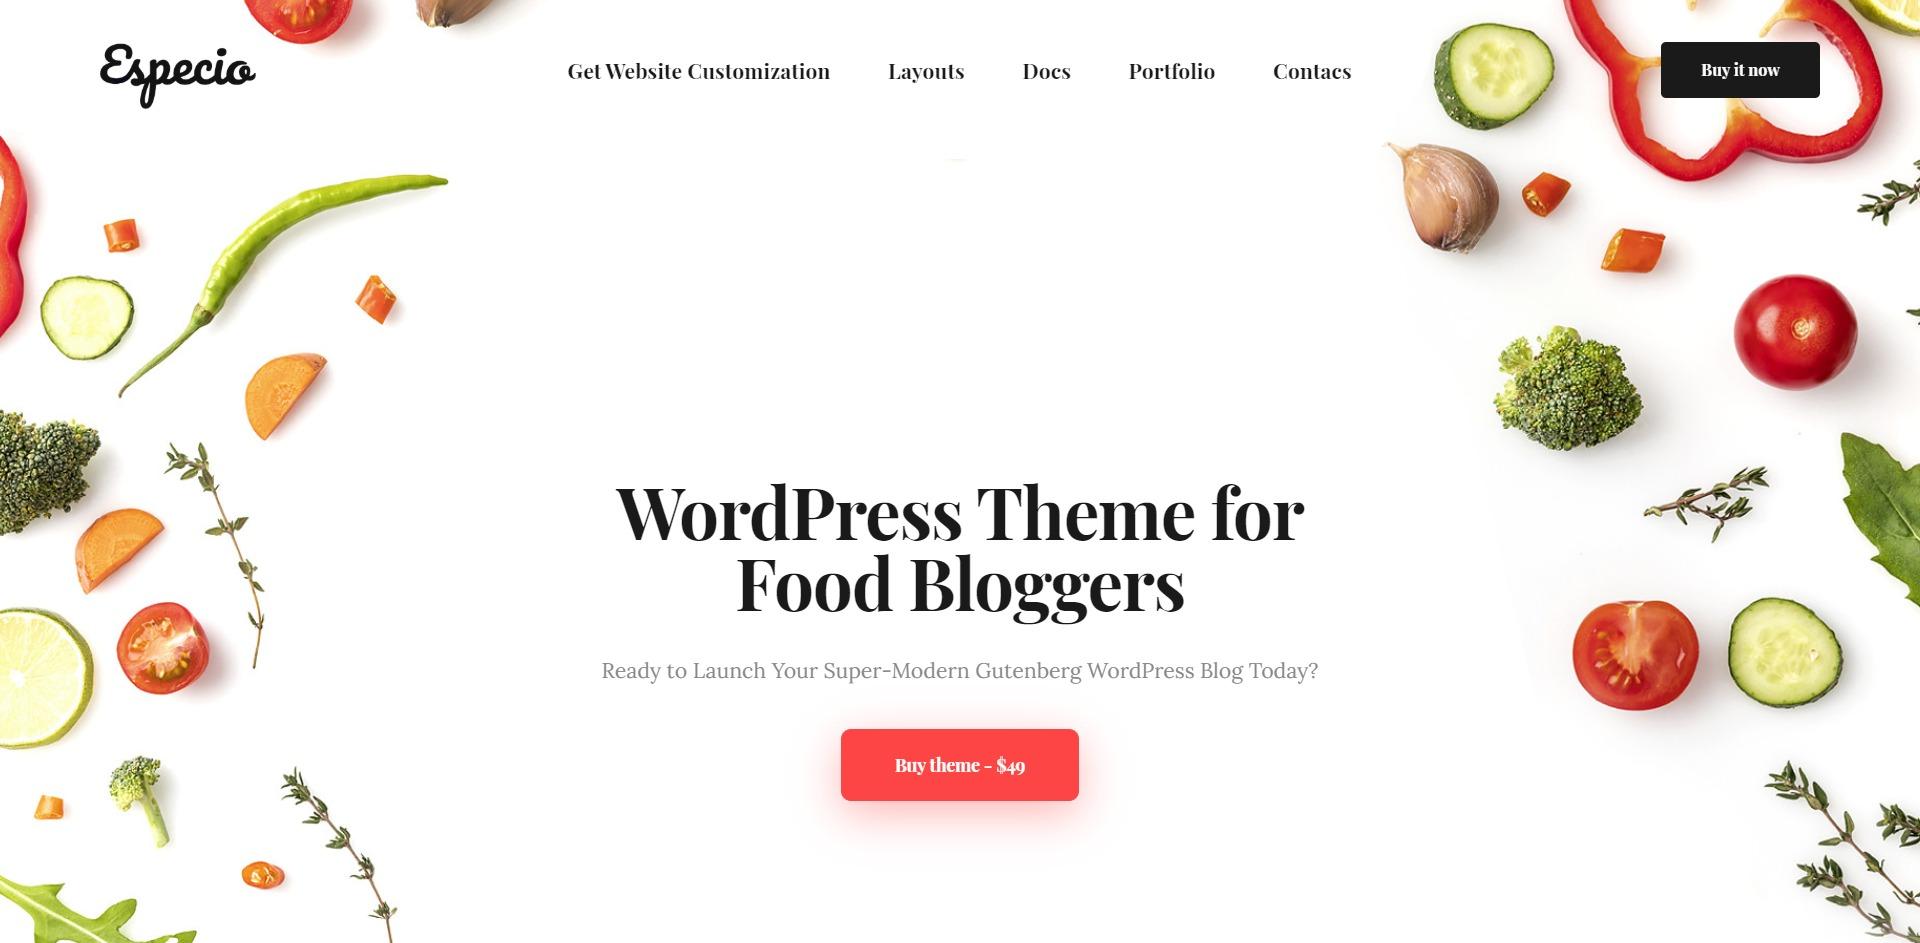 Especio-多功能可视化美食博客WordPress主题